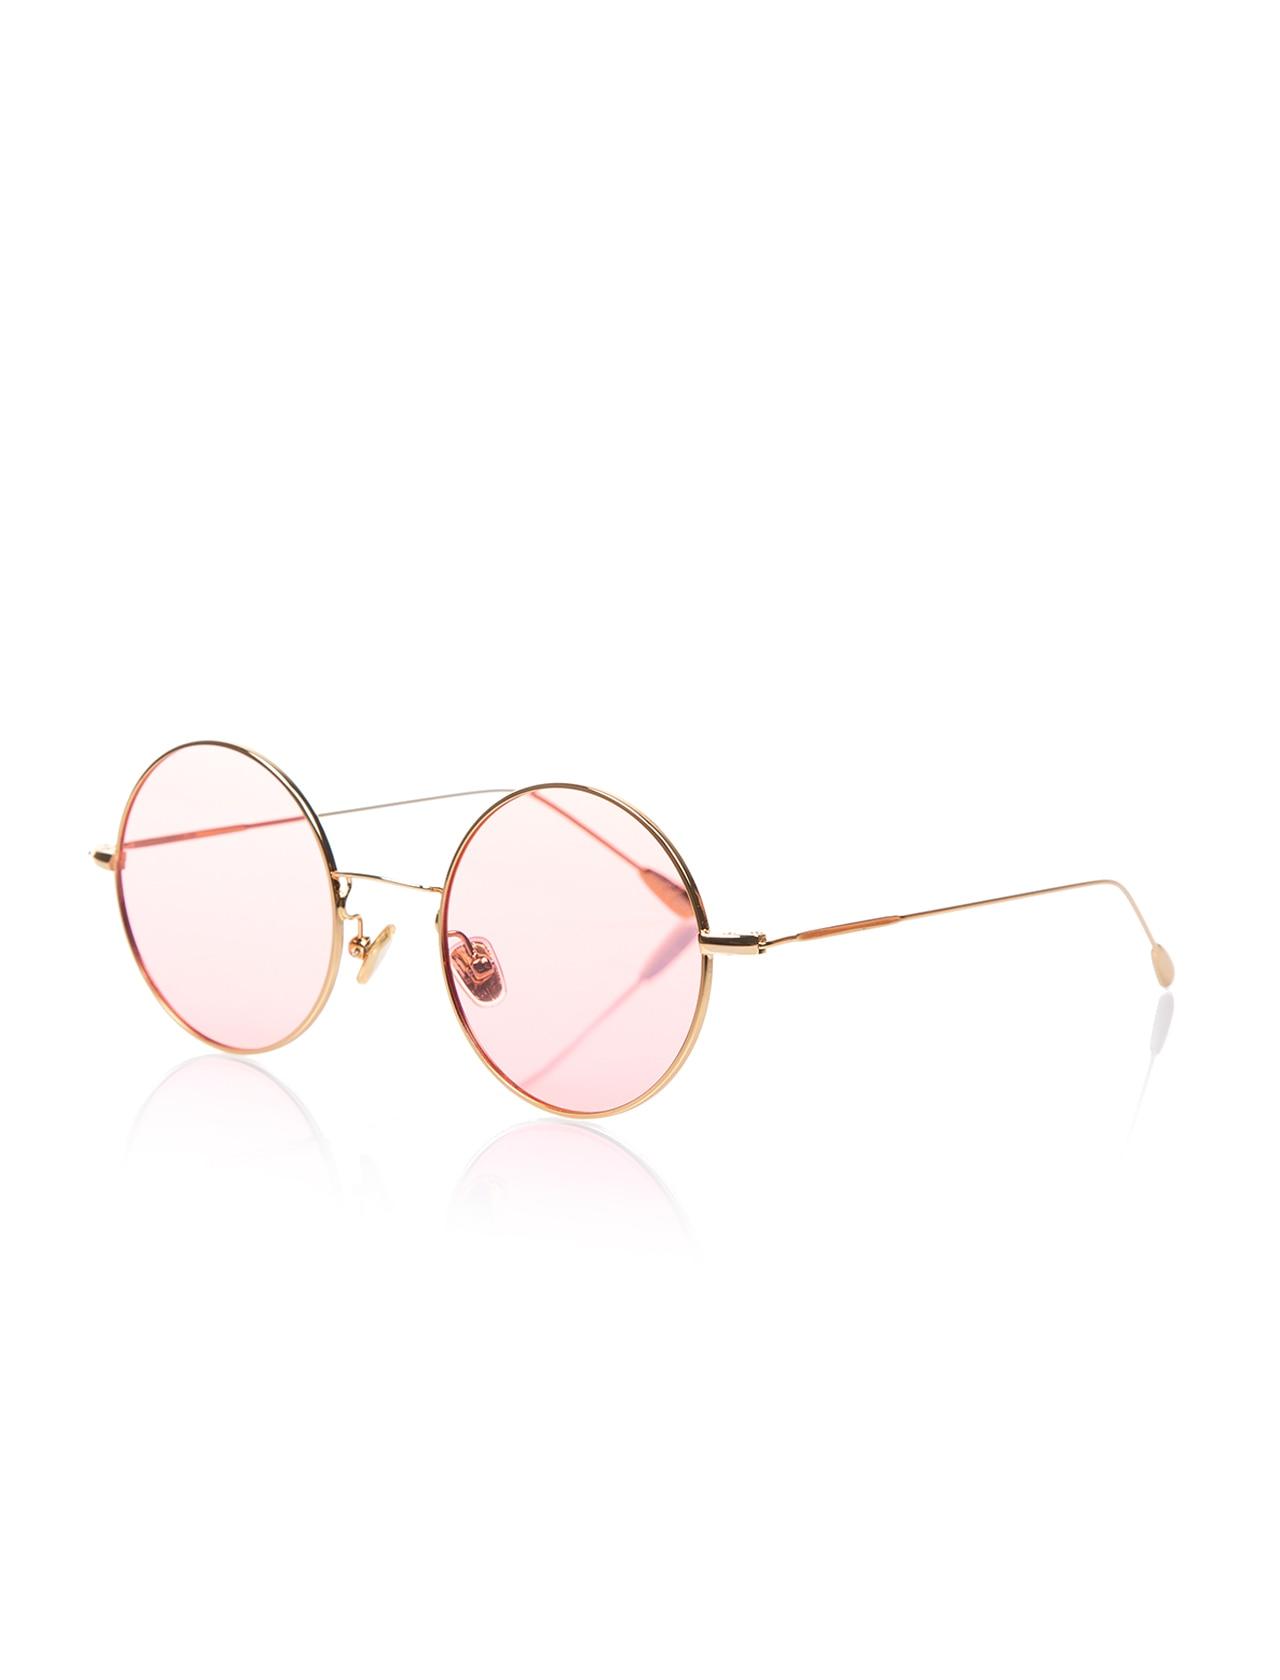 Unisex sunglasses opc 17014 05 metal yellow organic round round 50-22-145 optoline club